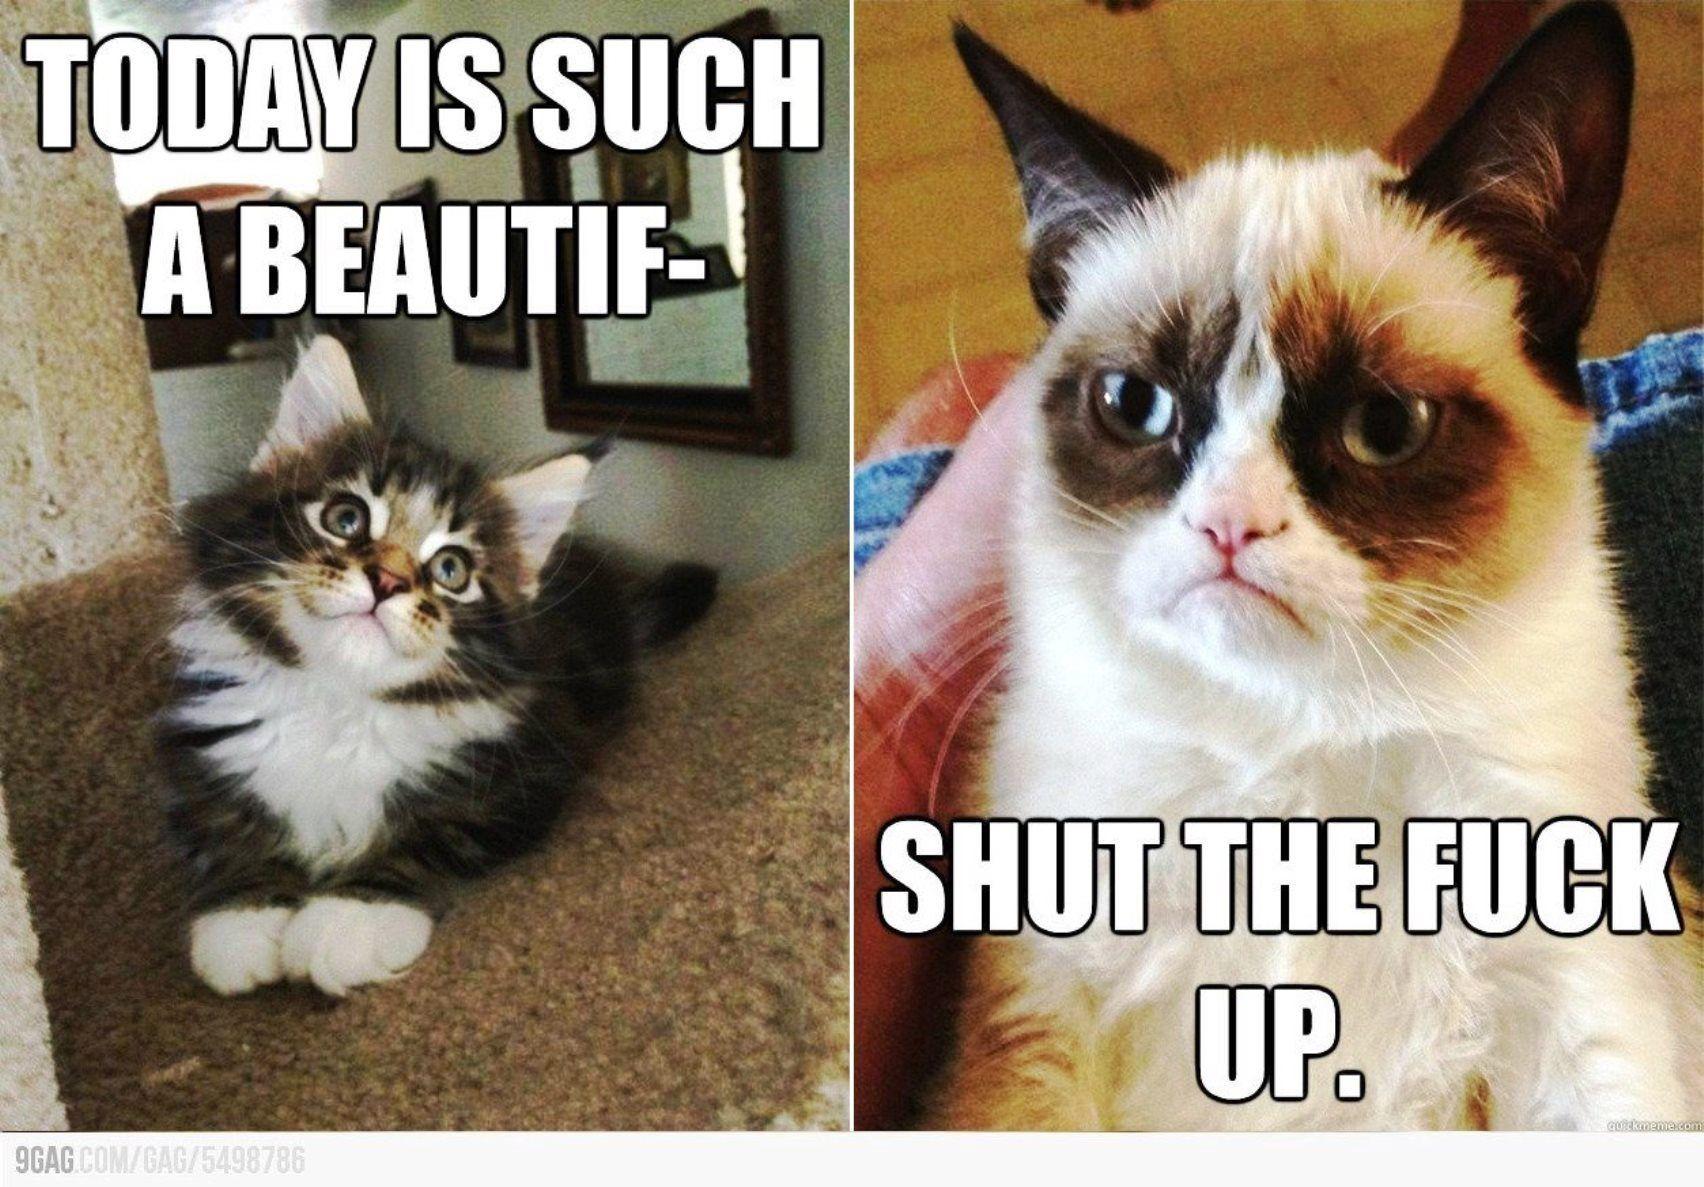 Funny Memes Quotes Tumblr : Unique funny happy birthday wishes tumblr